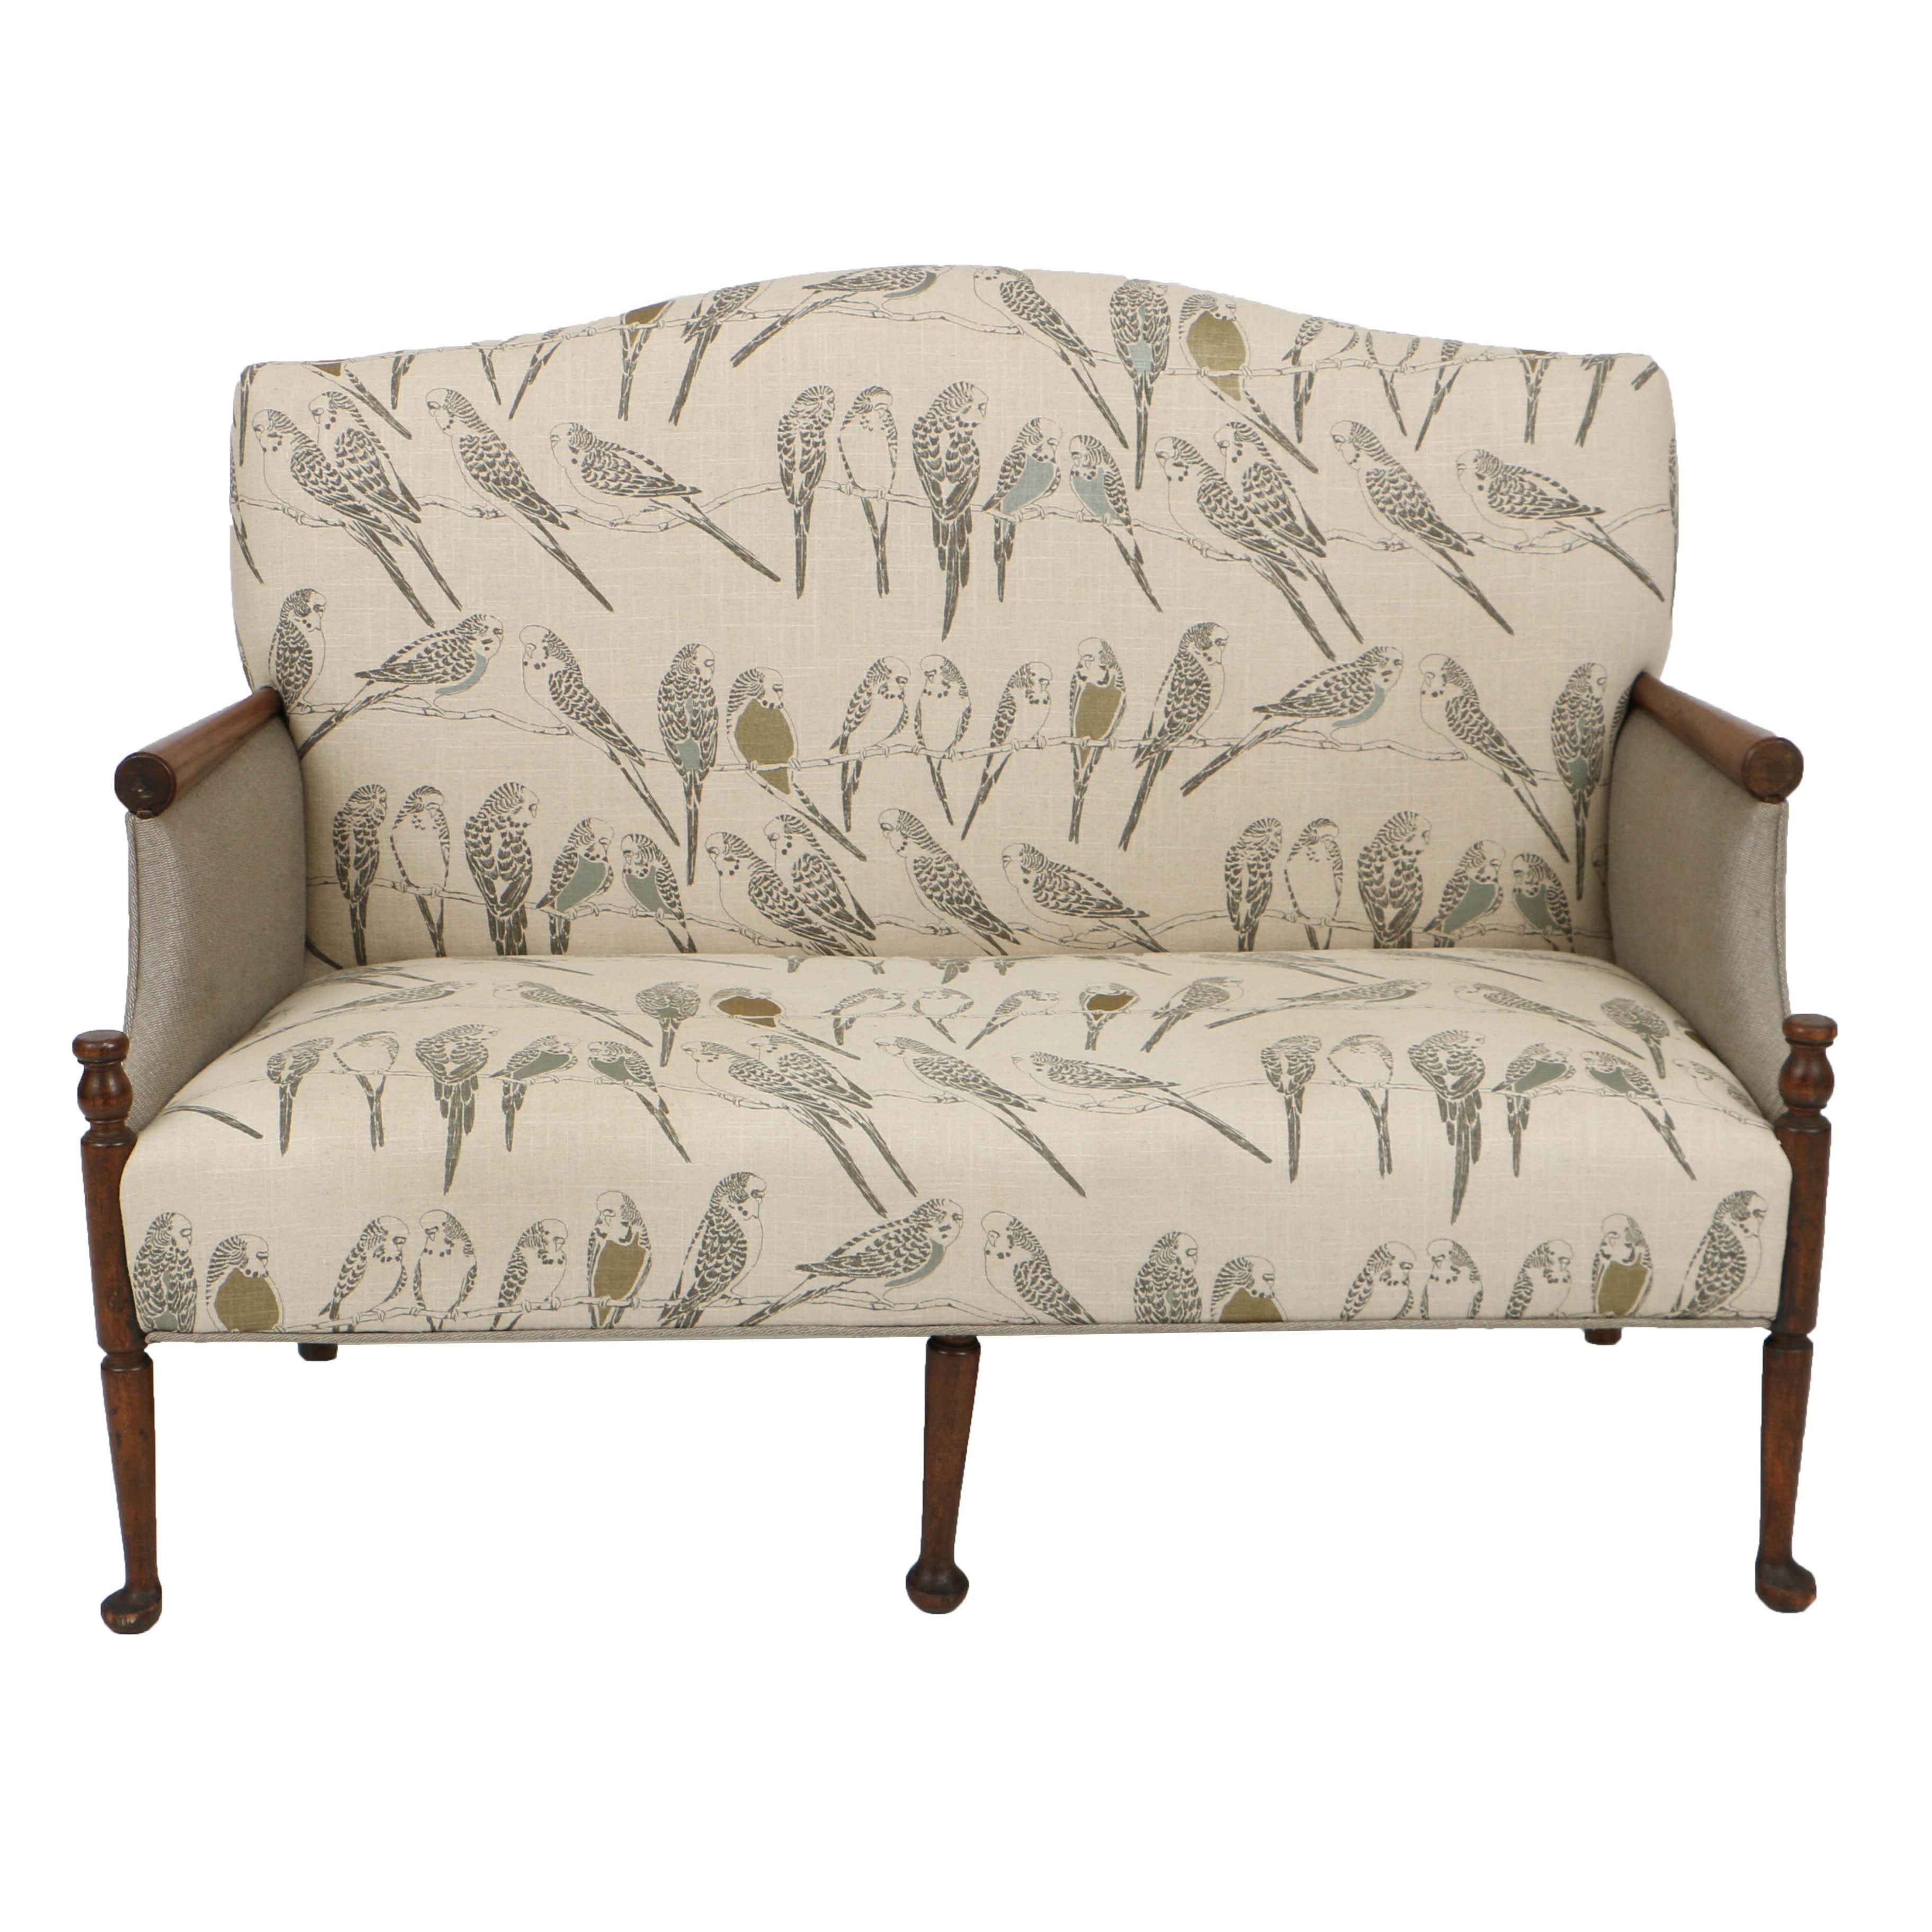 Vintage Queen Anne Style Walnut Settee in Custom, Parakeet Upholstery